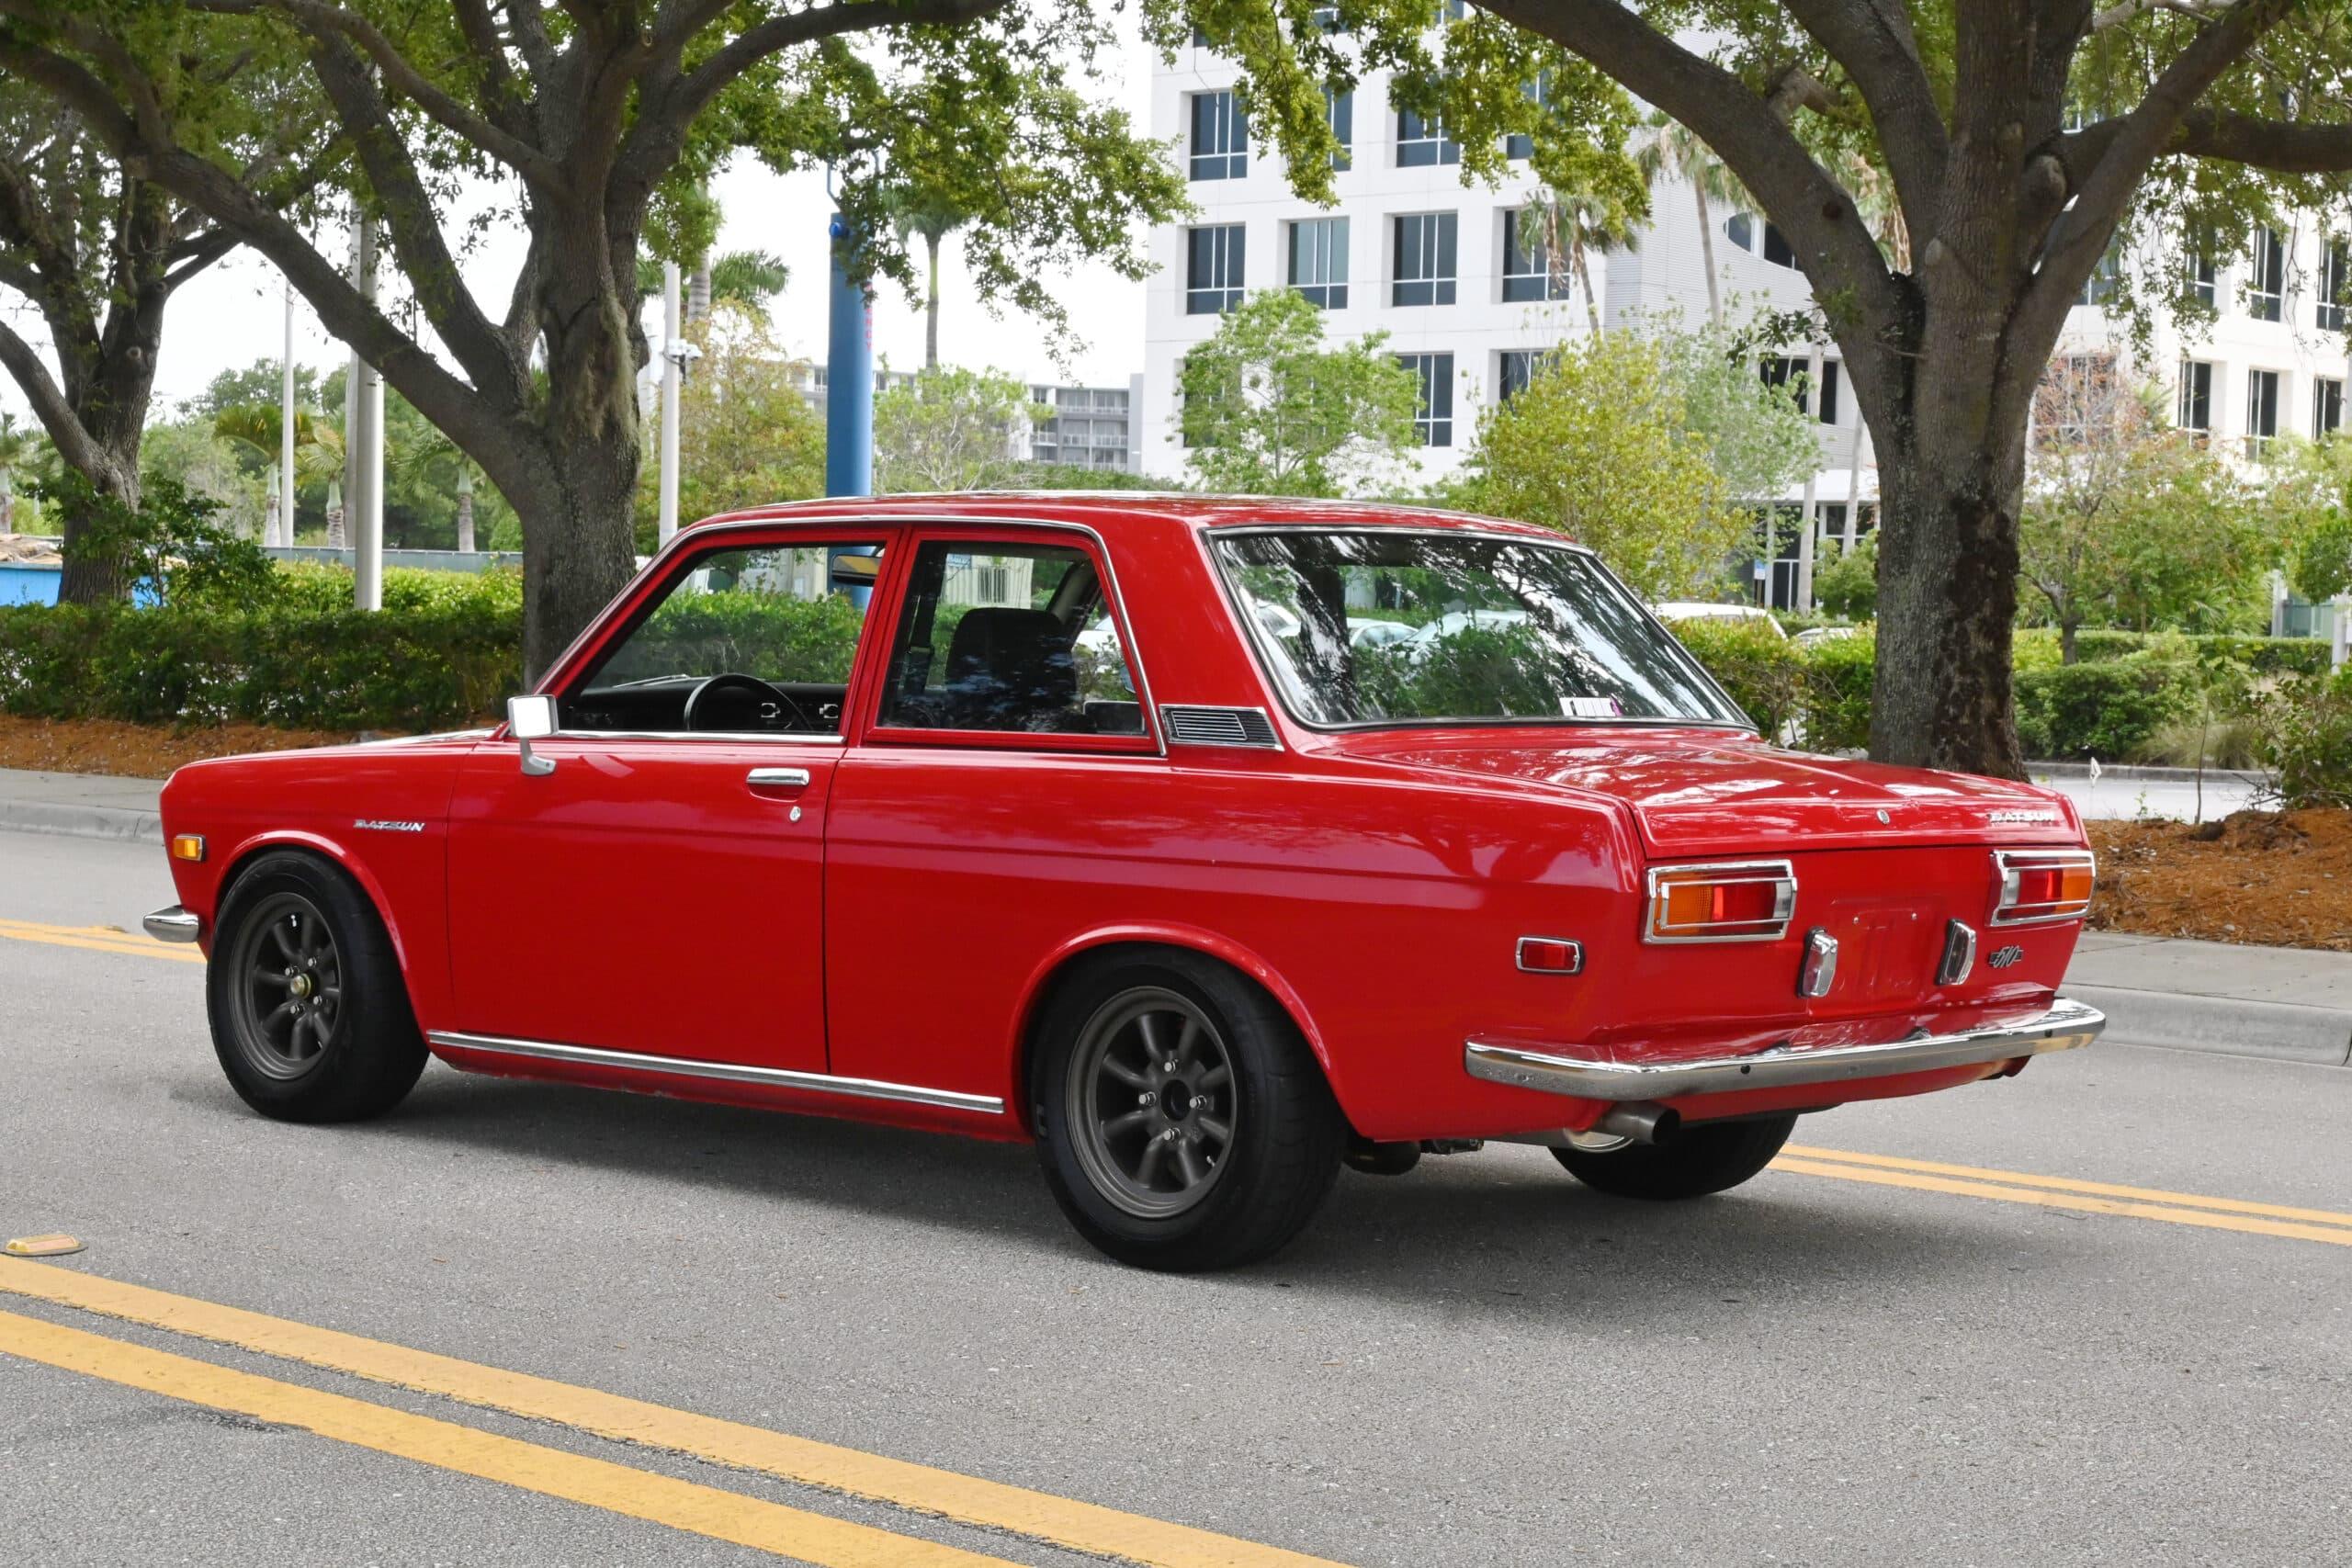 1971 Datsun 510, Extensive performance-oriented restoration Rebello built 2.4L stroker, 5-speed, LSD, Watanabe wheels, Mikuni Side Draft Carburetors, California Car.